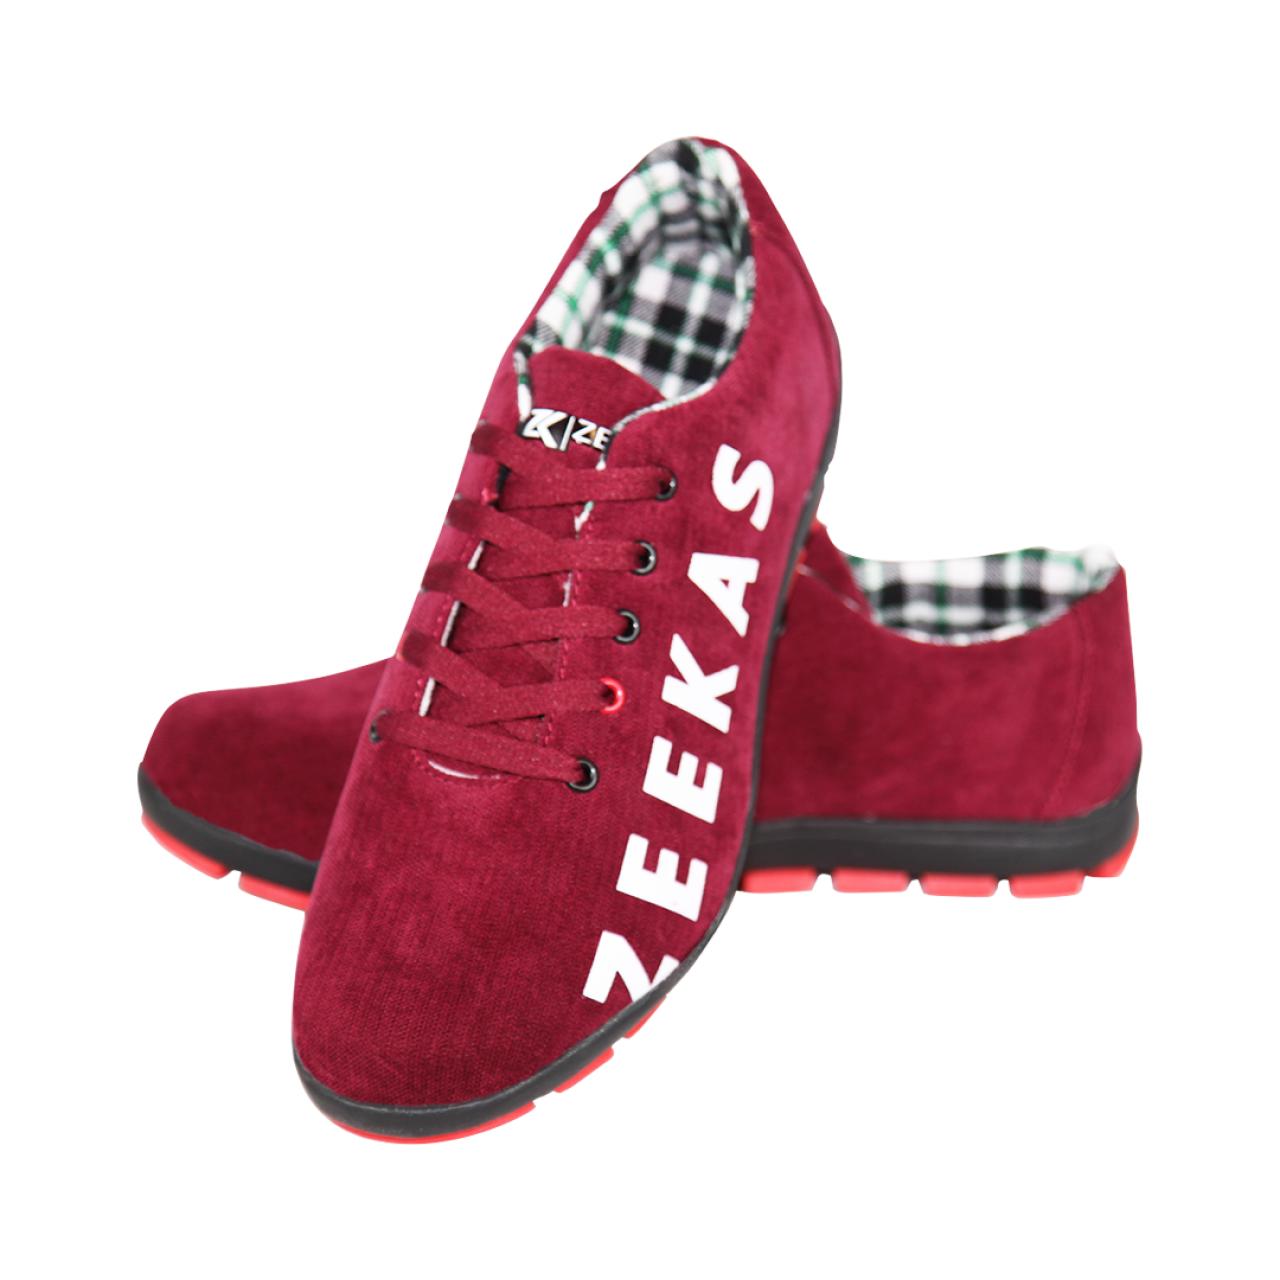 Zeekas Men Lace Up Cross Trainers Sneakers Shoes - Maroon / Red